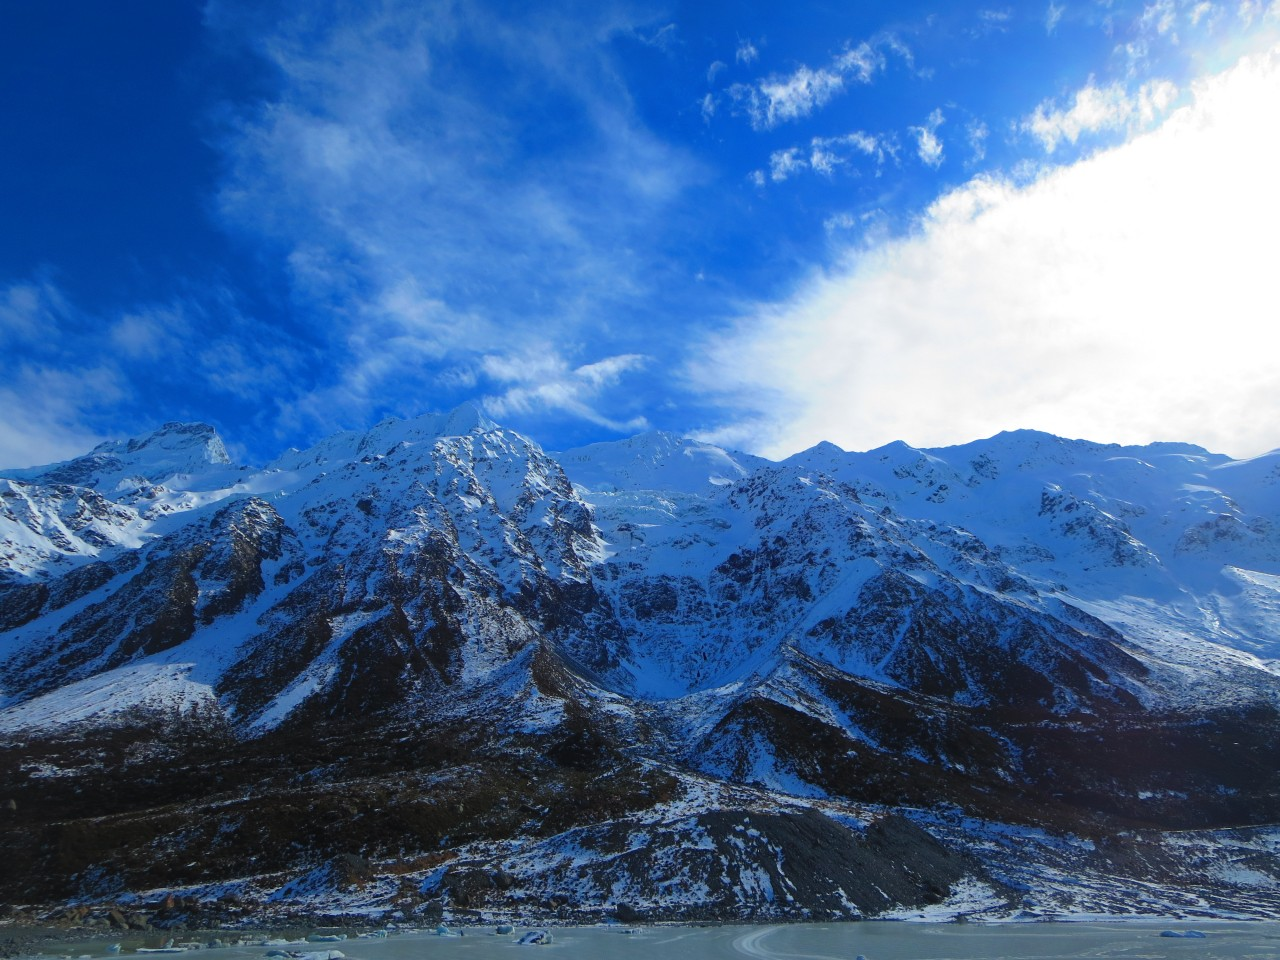 Aoraki / Mount Cook